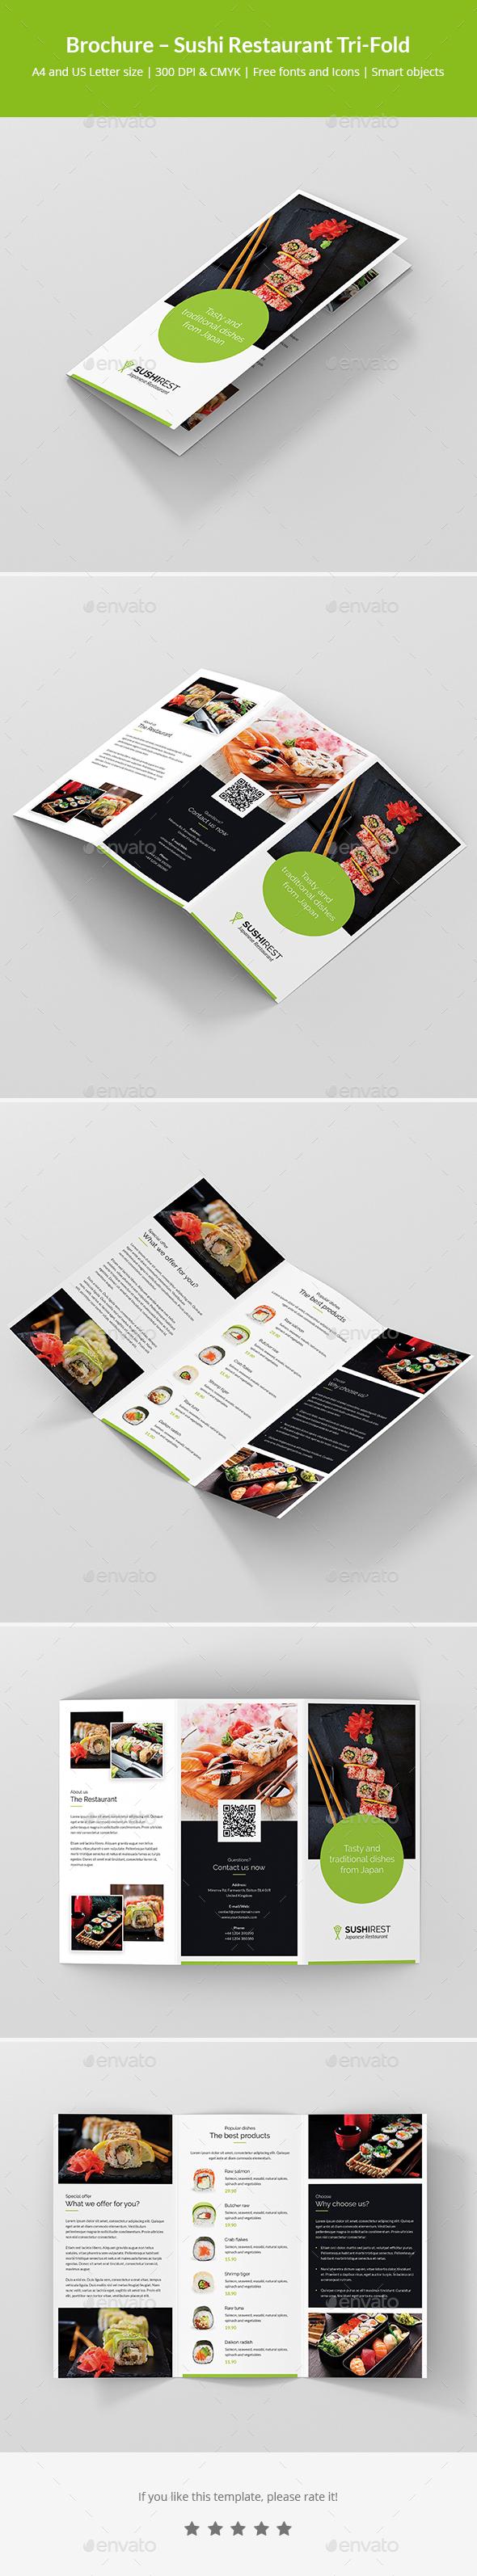 GraphicRiver Brochure Sushi Restaurant Tri-Fold 21113269